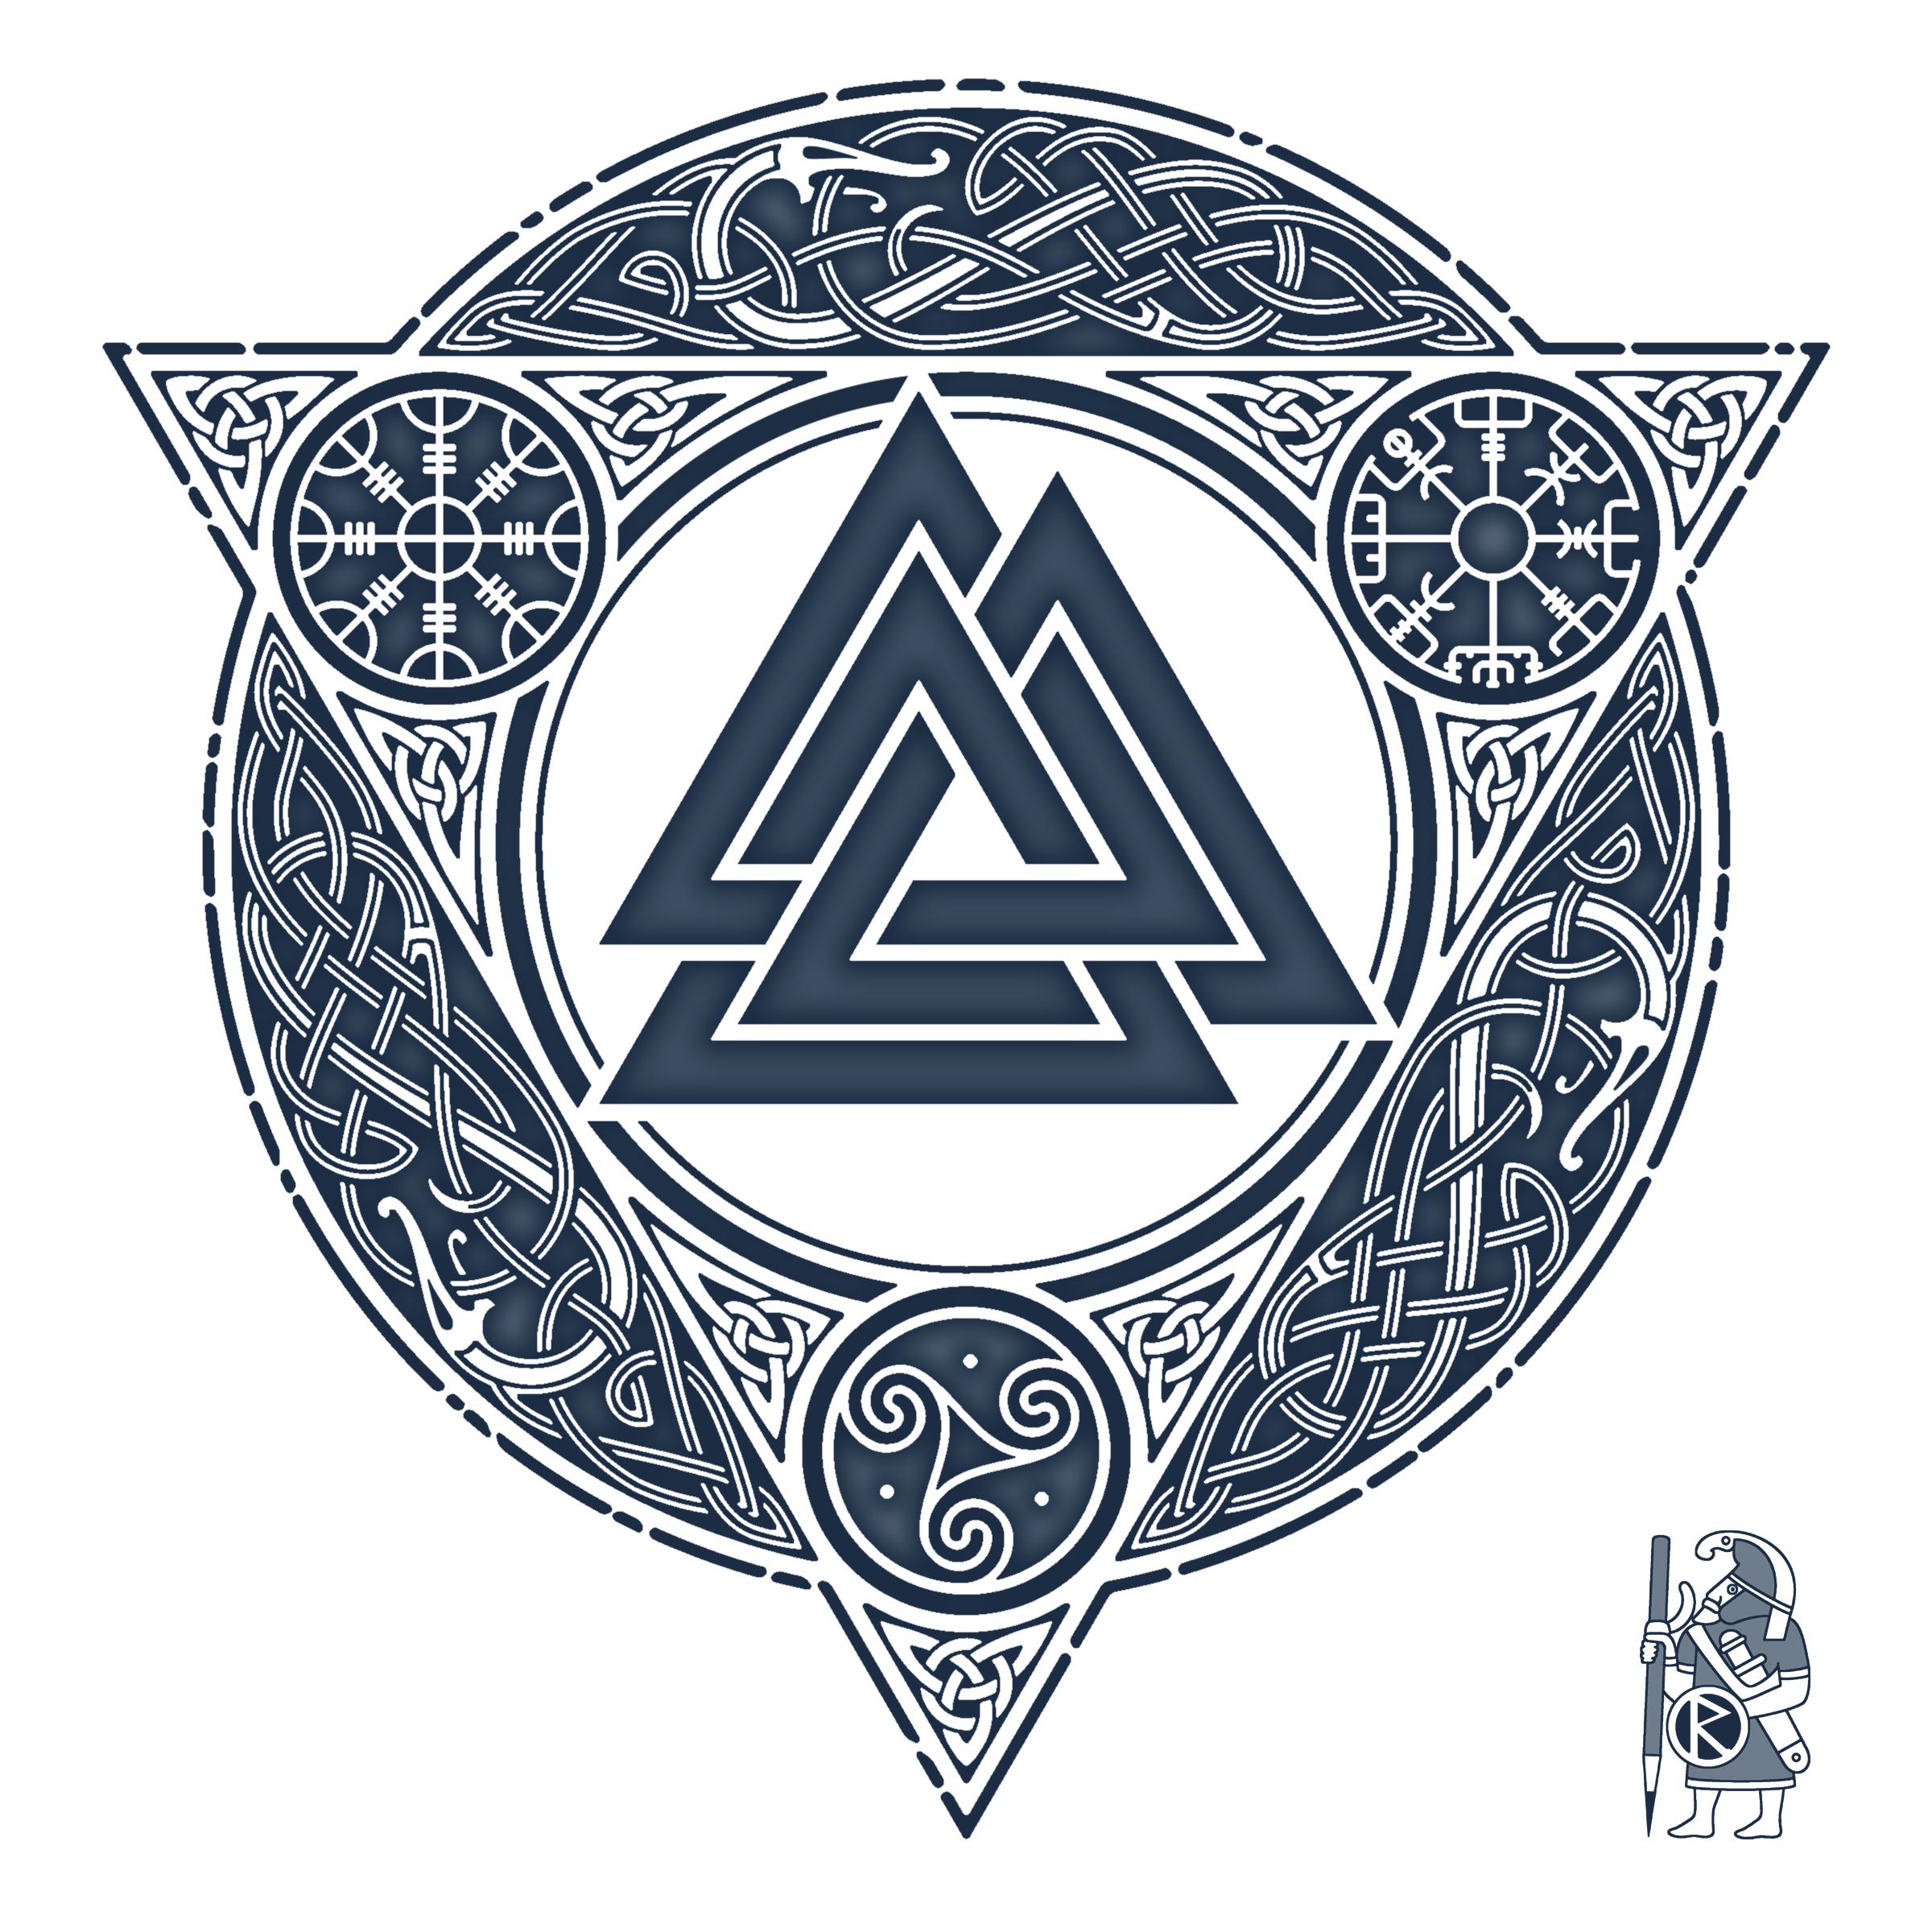 Valknut ice flame knotwork tattoo design by raidho for Valknut symbol tattoo